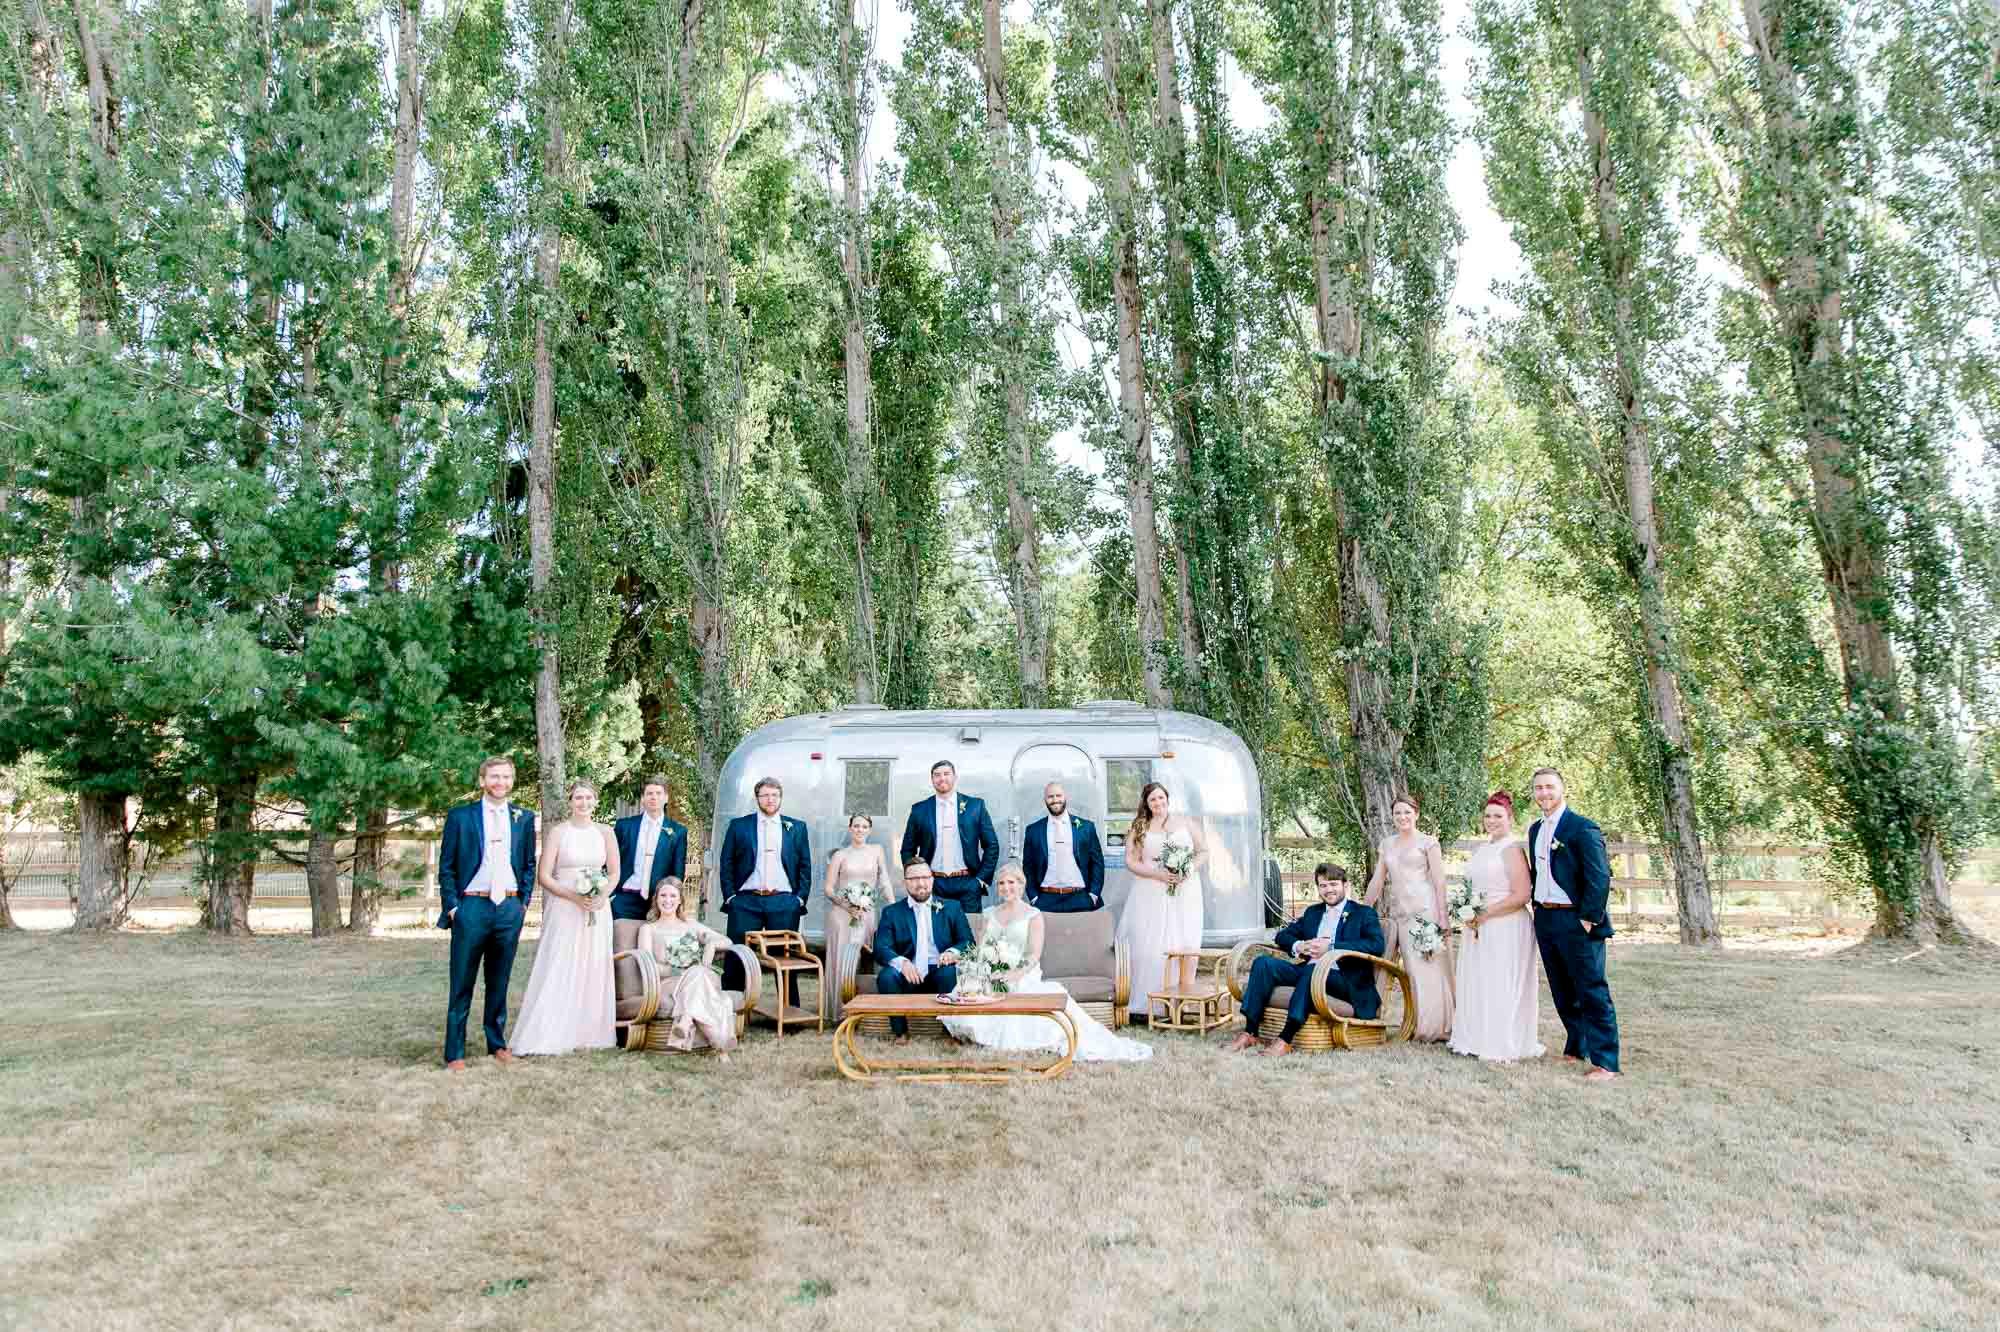 whidbey-island-wayfarer-destination-wedding 19.jpg